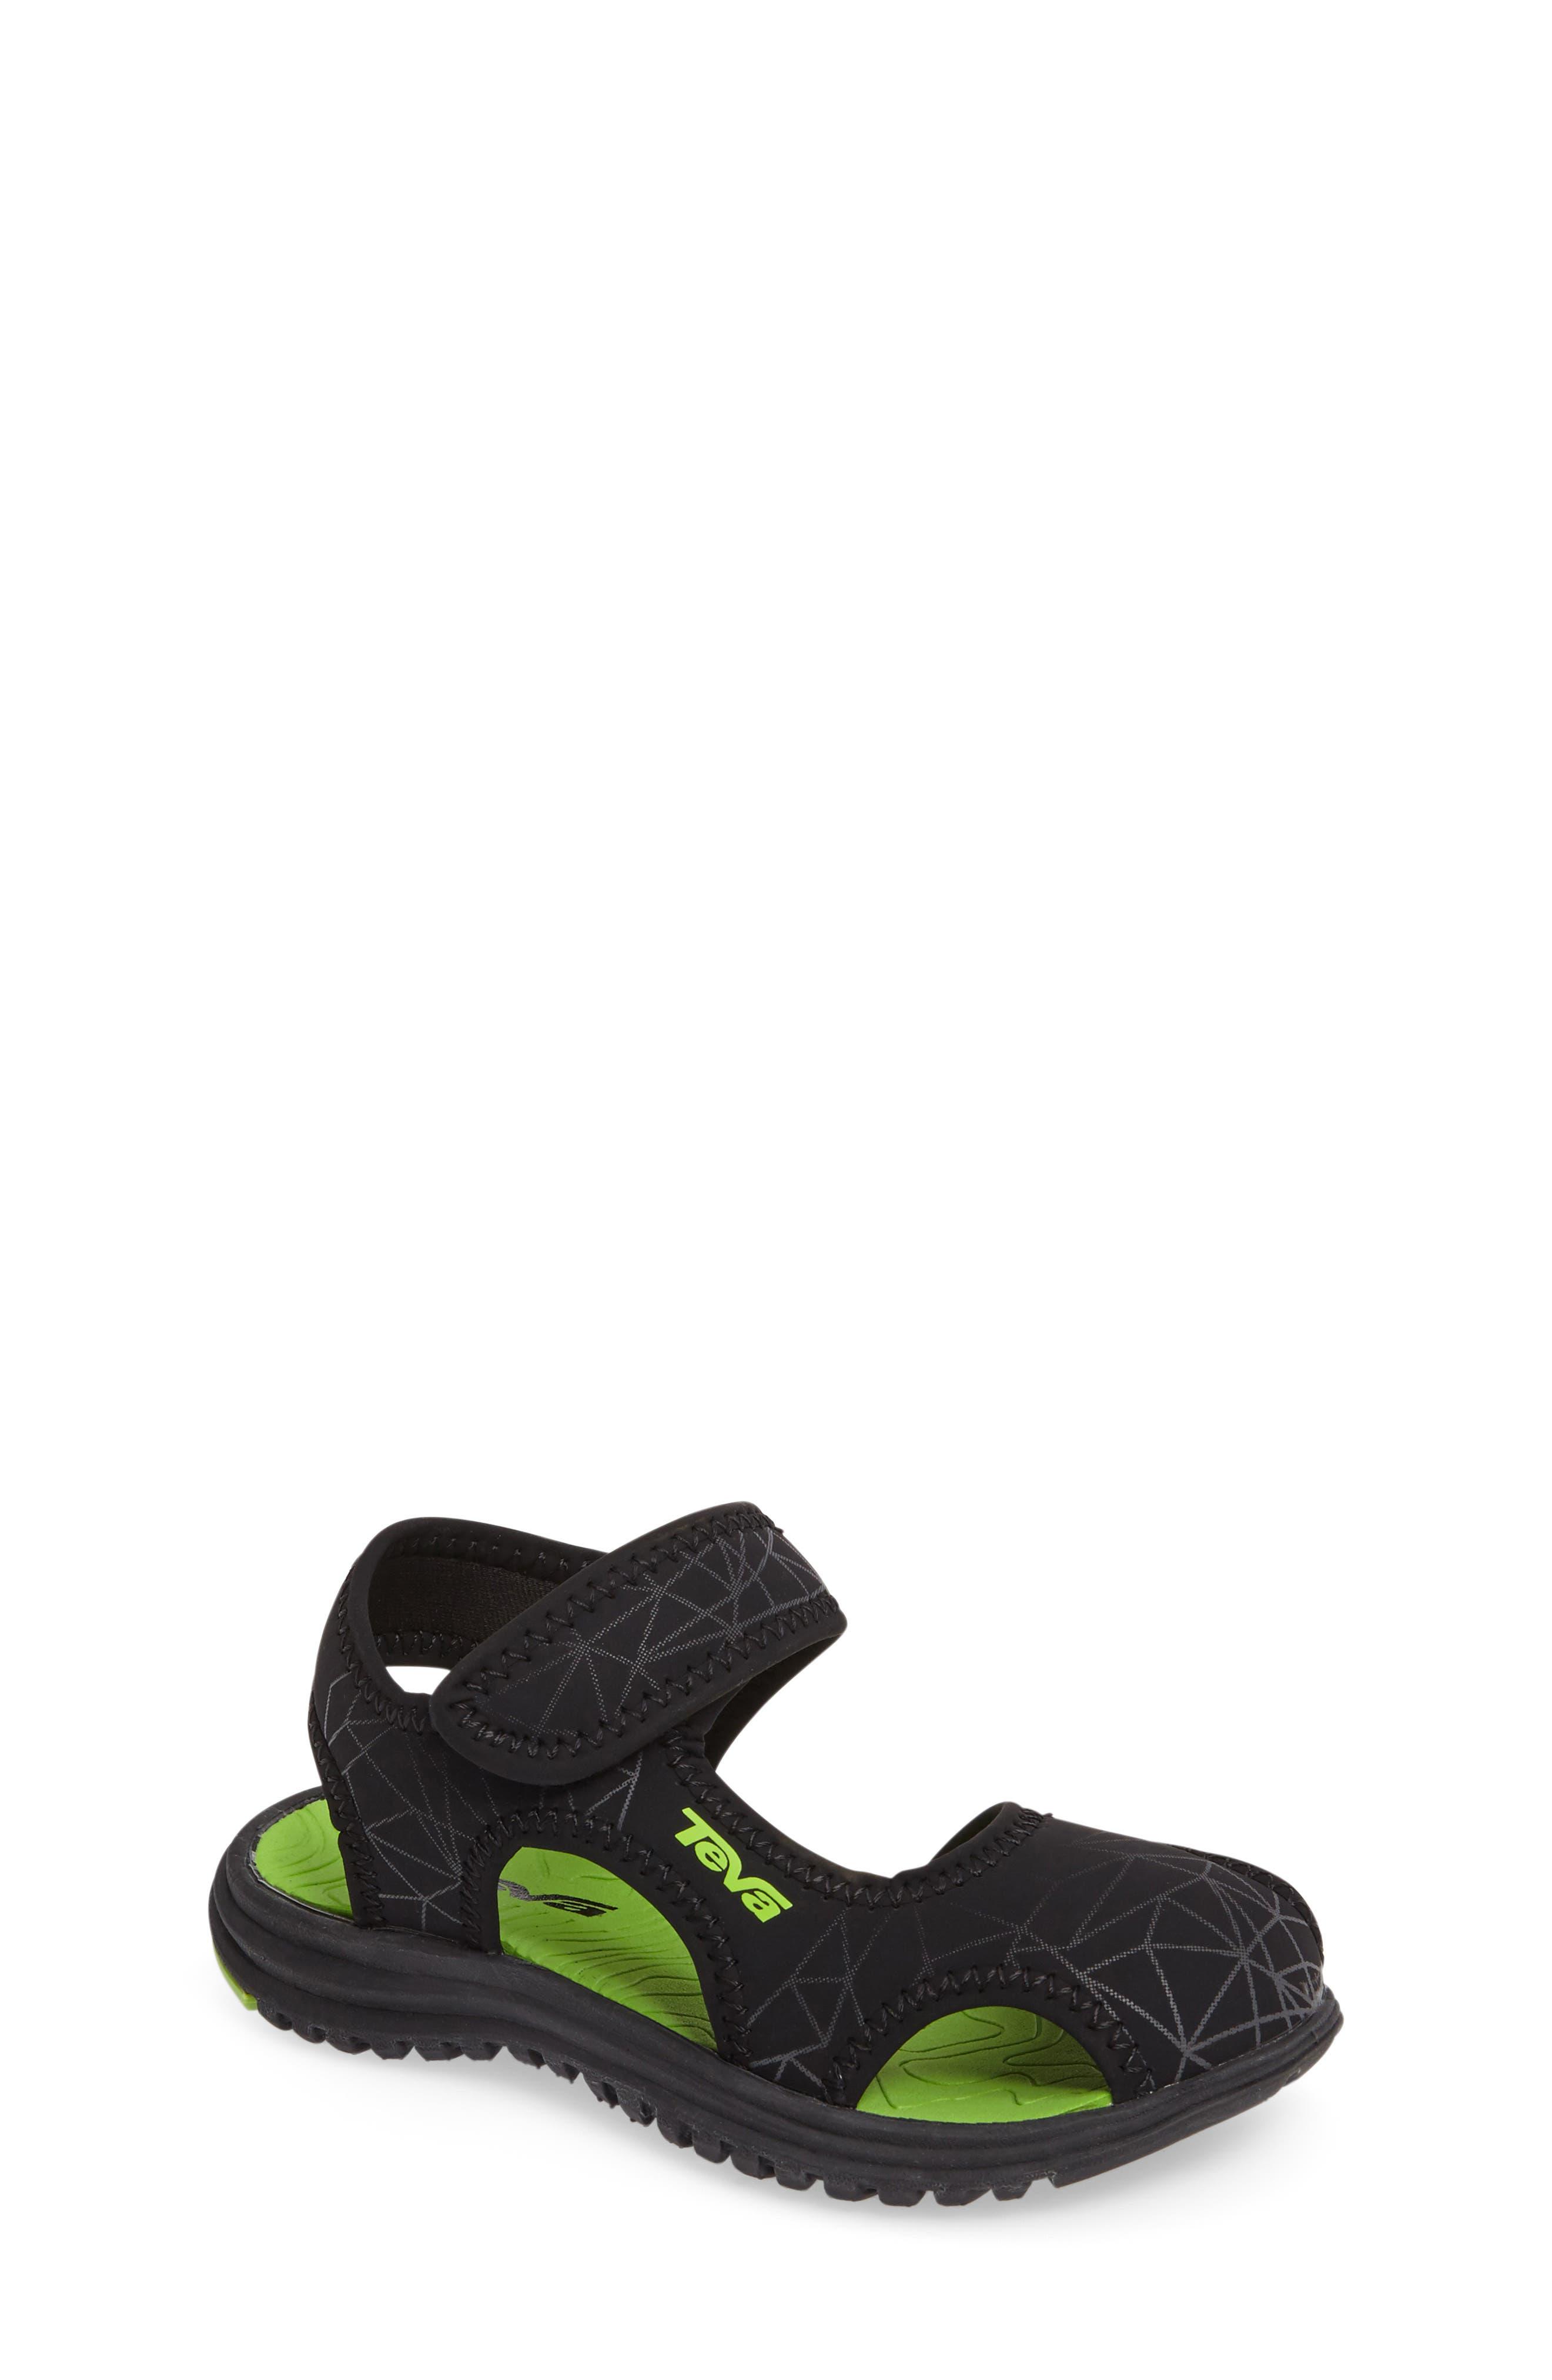 Teva 'Tidepool' Water Sandal (Baby, Walker, Toddler & Little Kid)